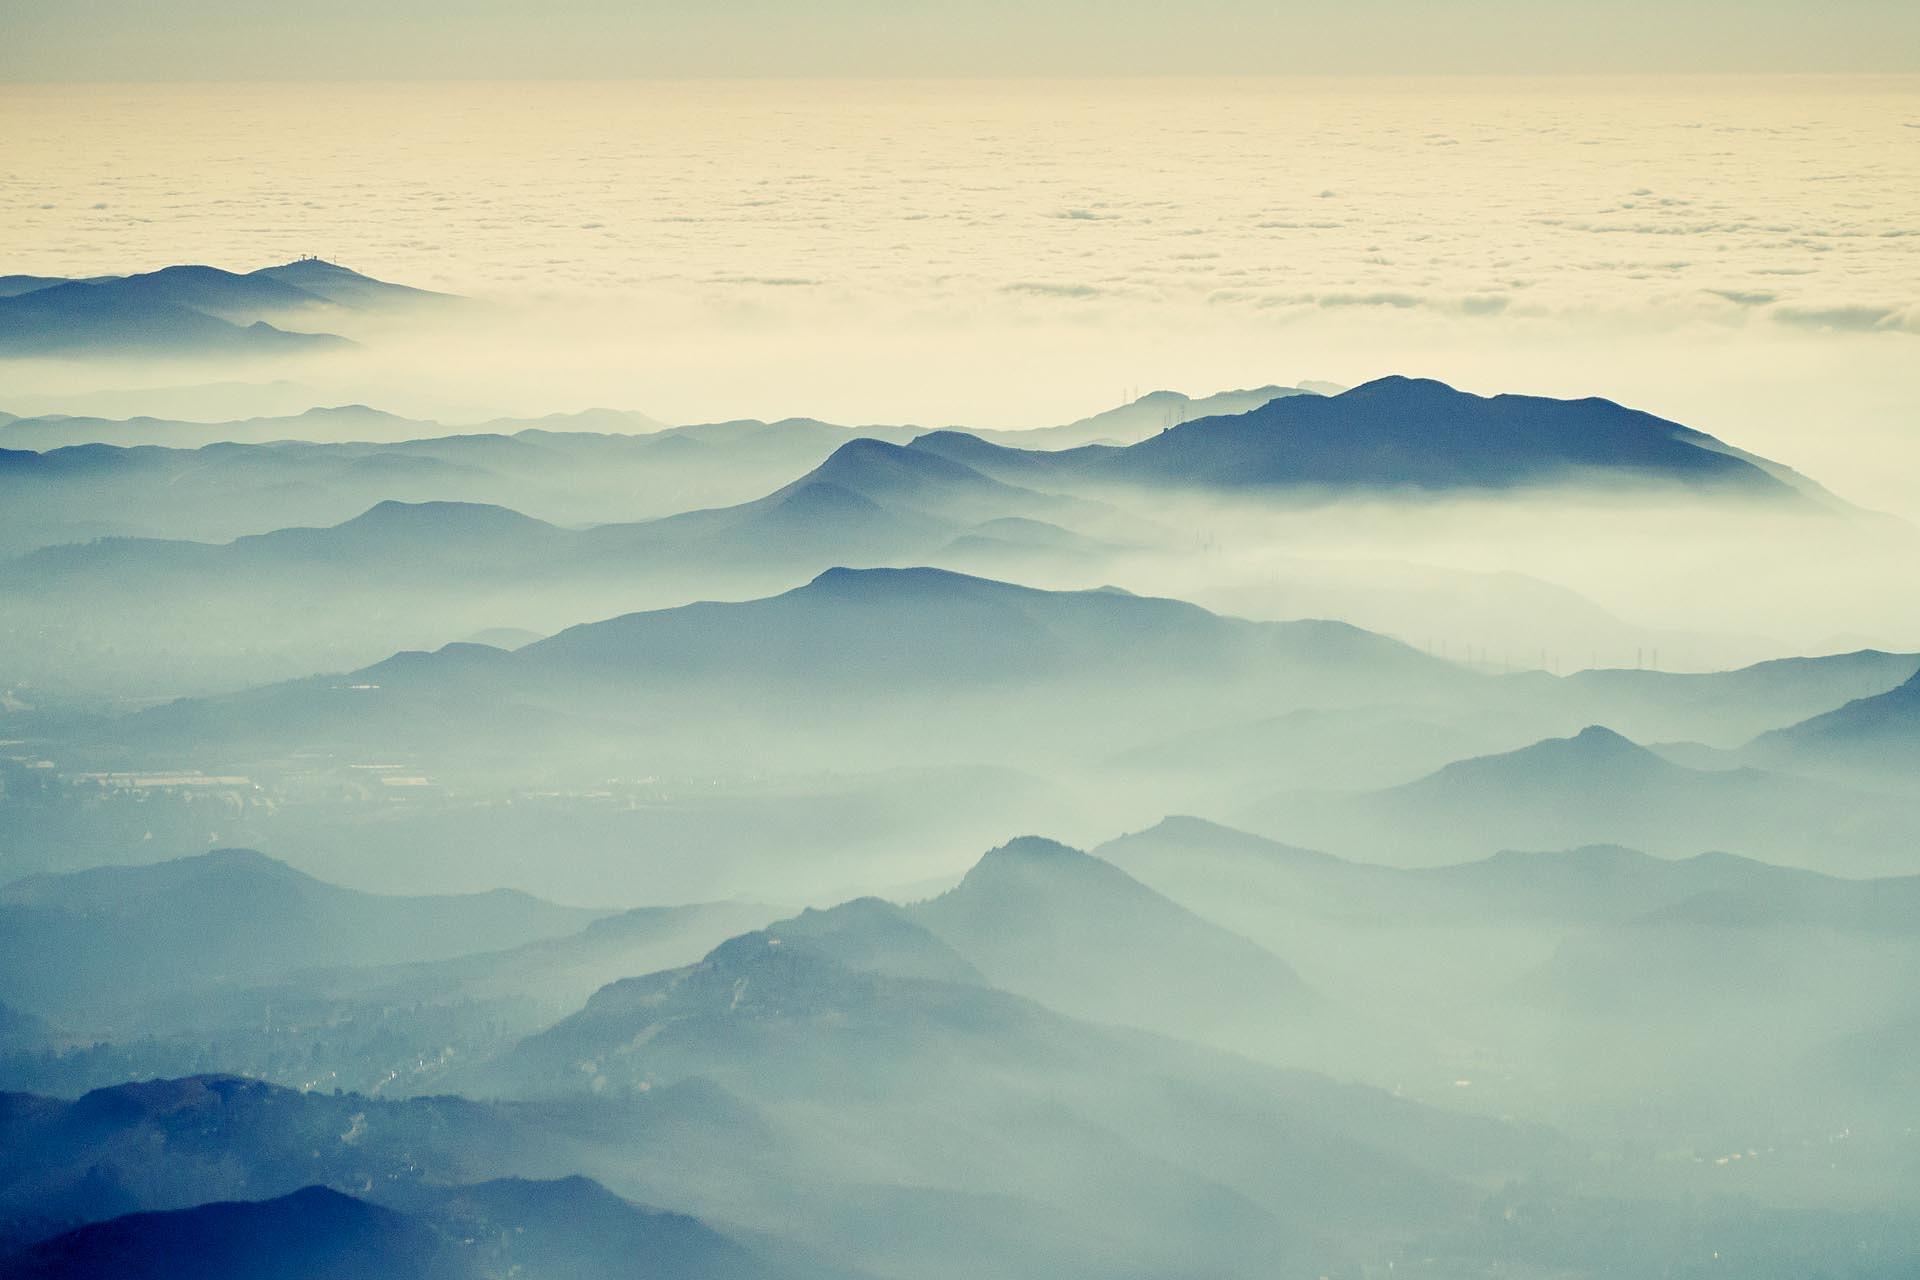 Aerial_PhillipAngert - 16.jpg